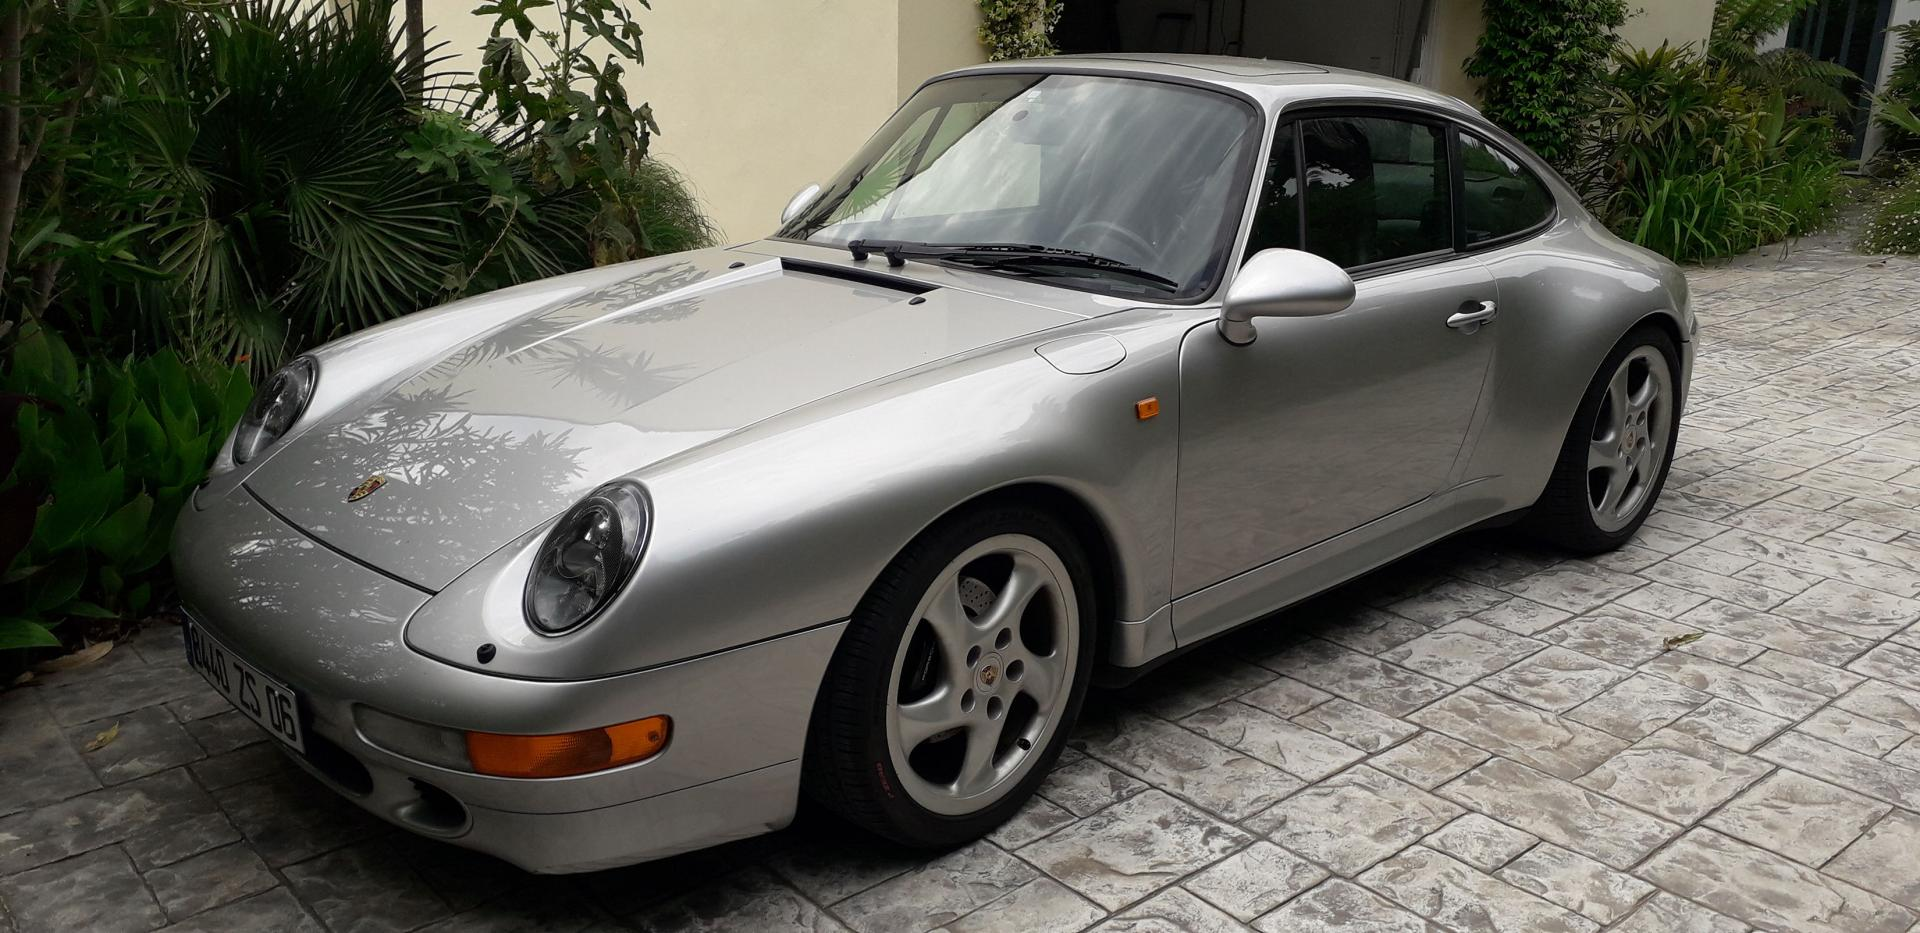 Porsche 993 Carrera 4S/2S X51 (Porsche 993)